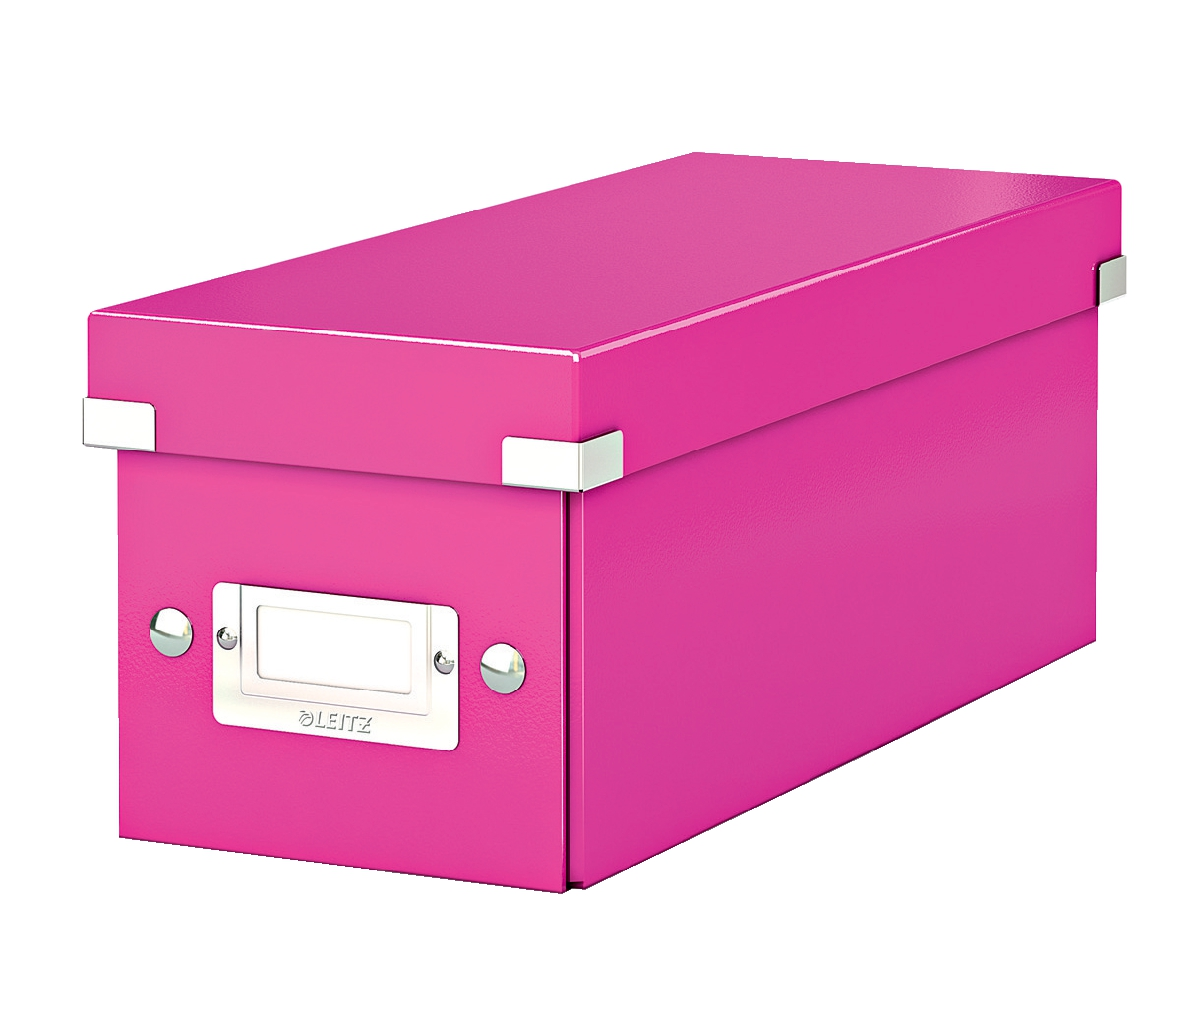 Leitz Click & Store CD Storage Box Pink